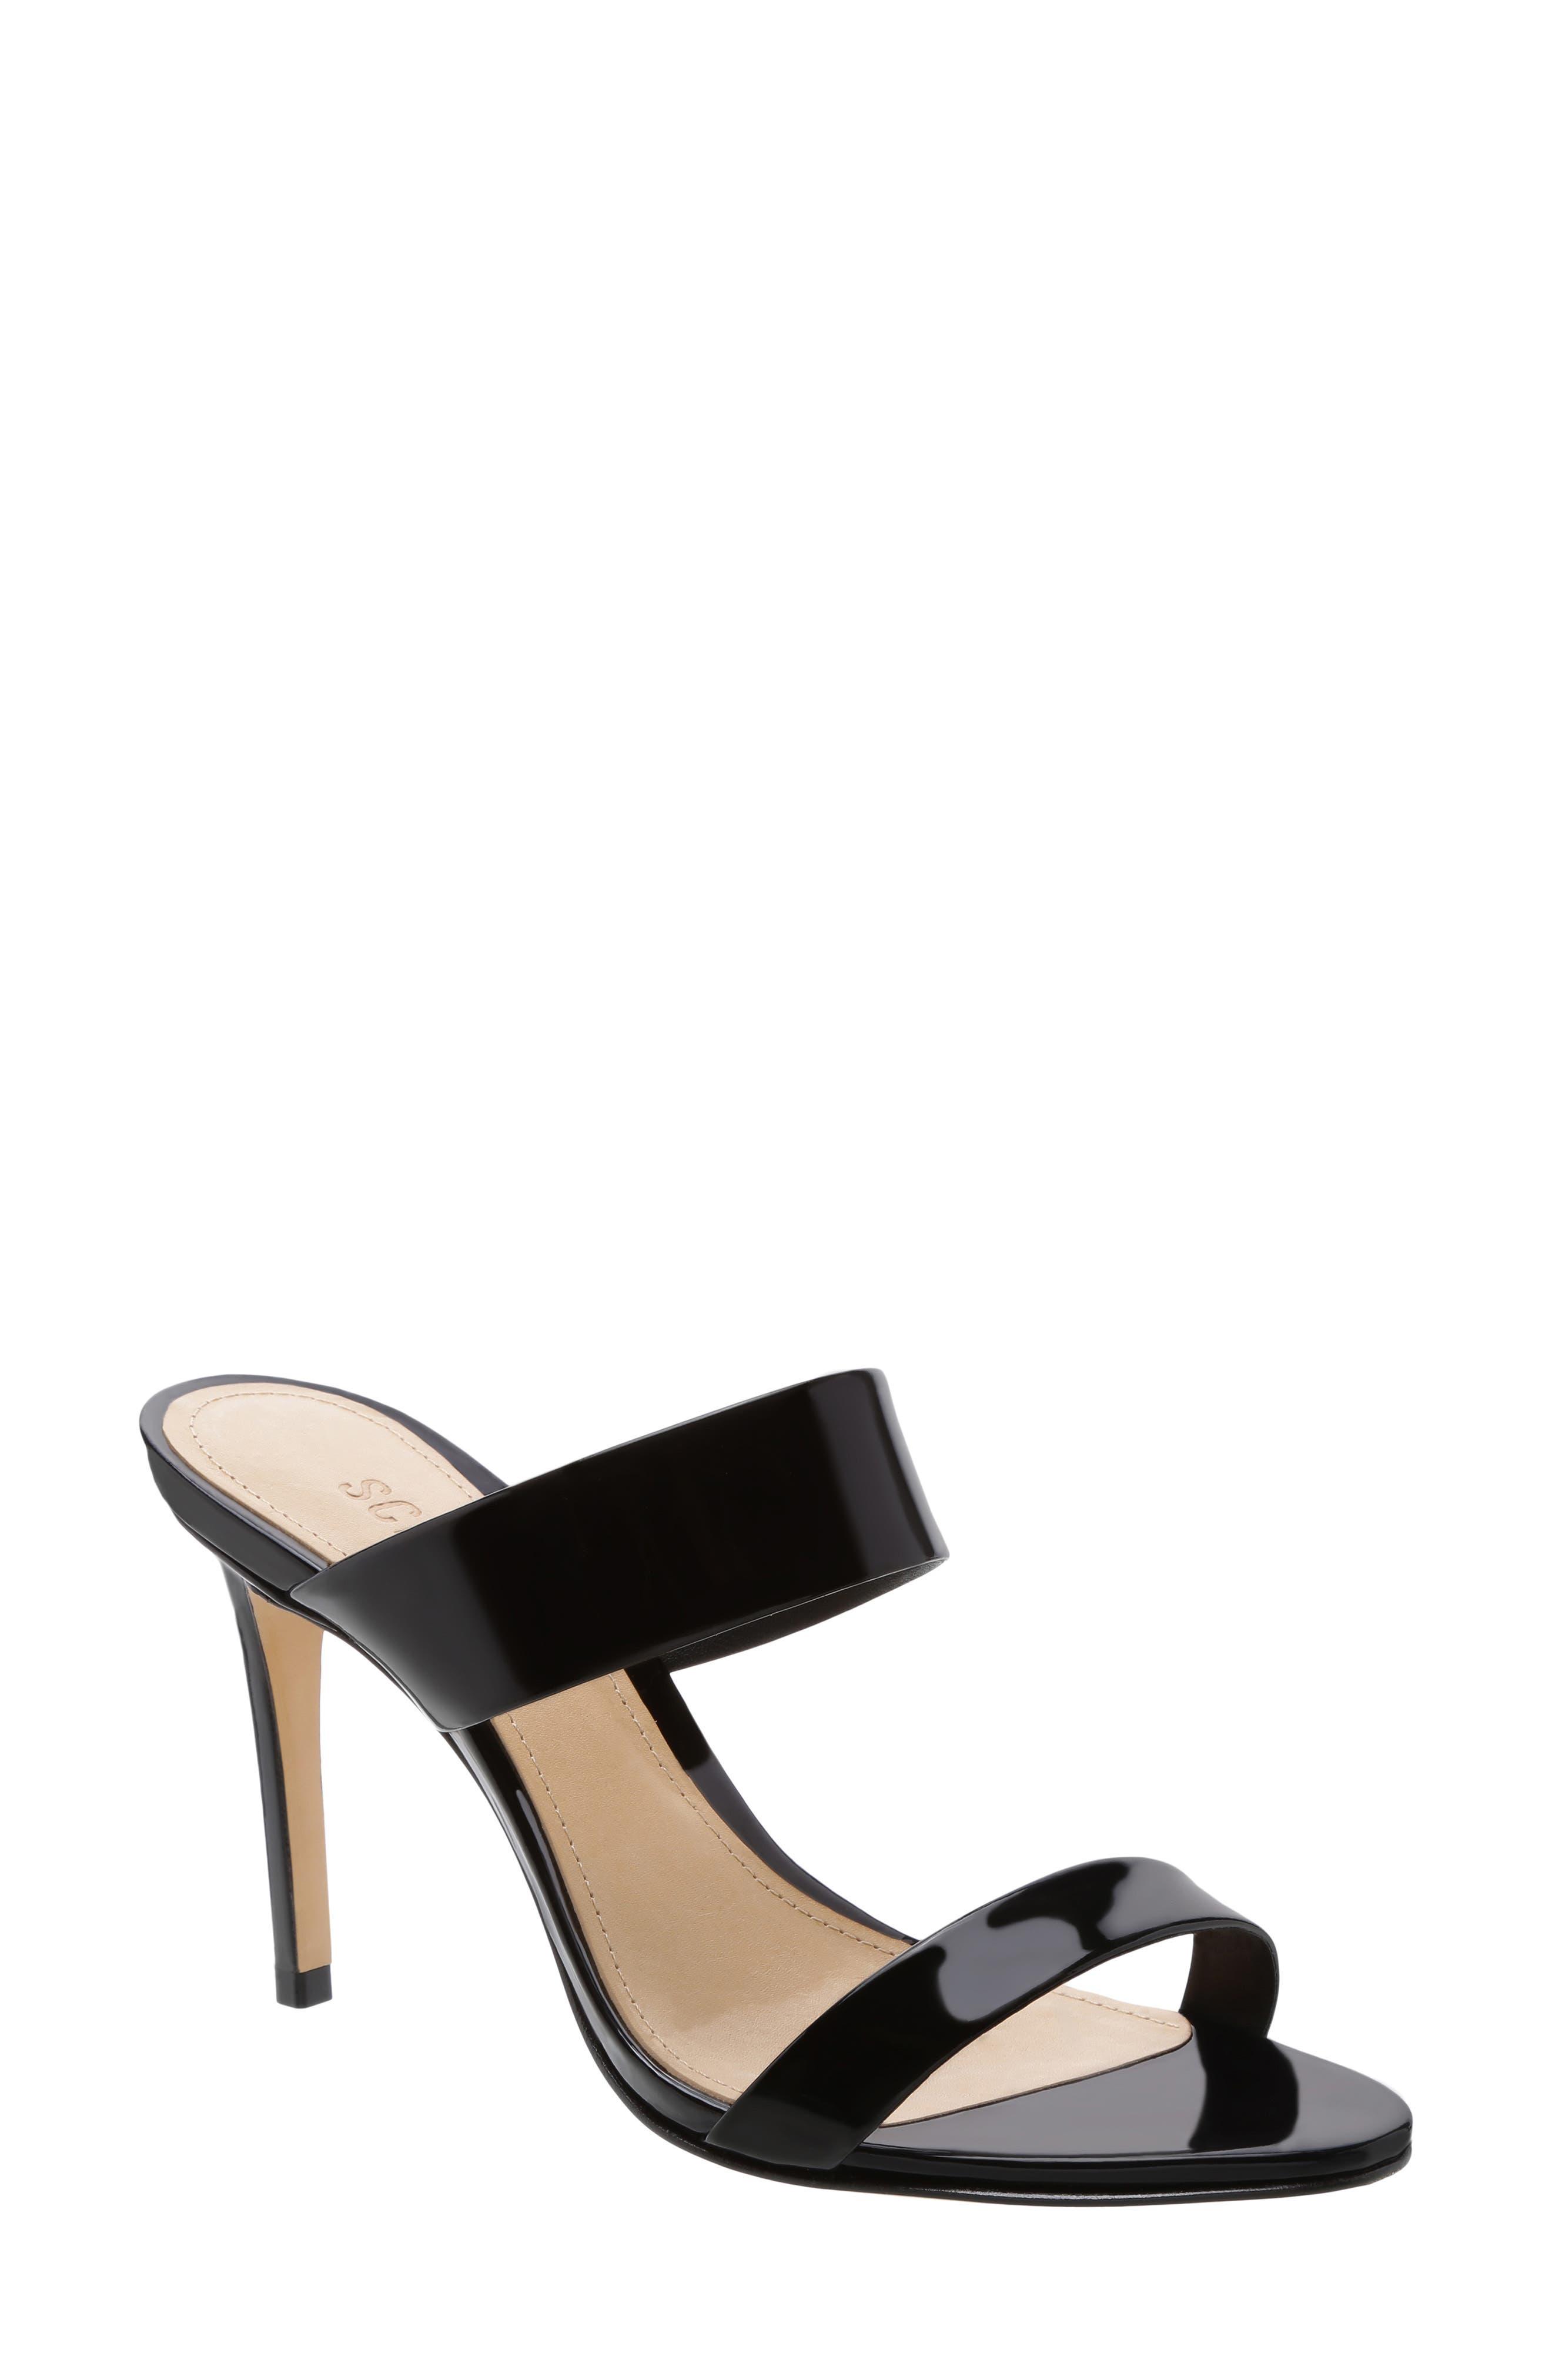 Stiletto Slide Sandal,                             Main thumbnail 1, color,                             BLACK PATENT LEATHER